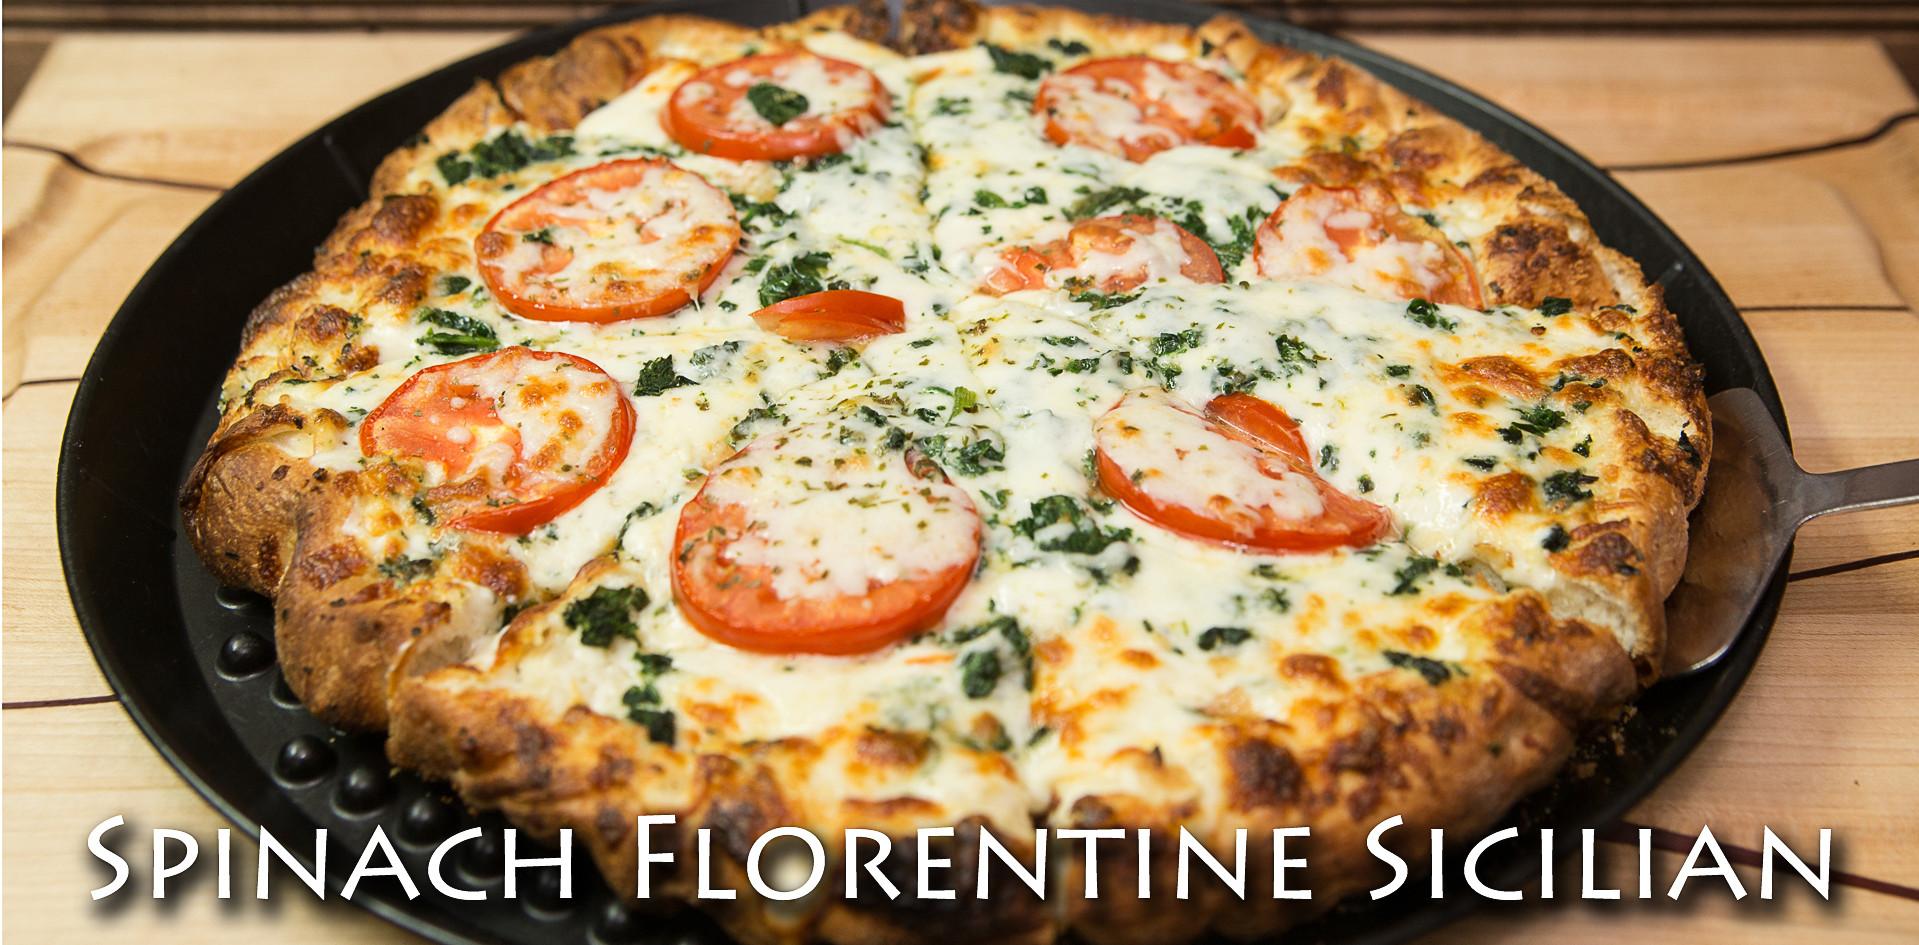 Spinach Florentine Sicilian Pizza